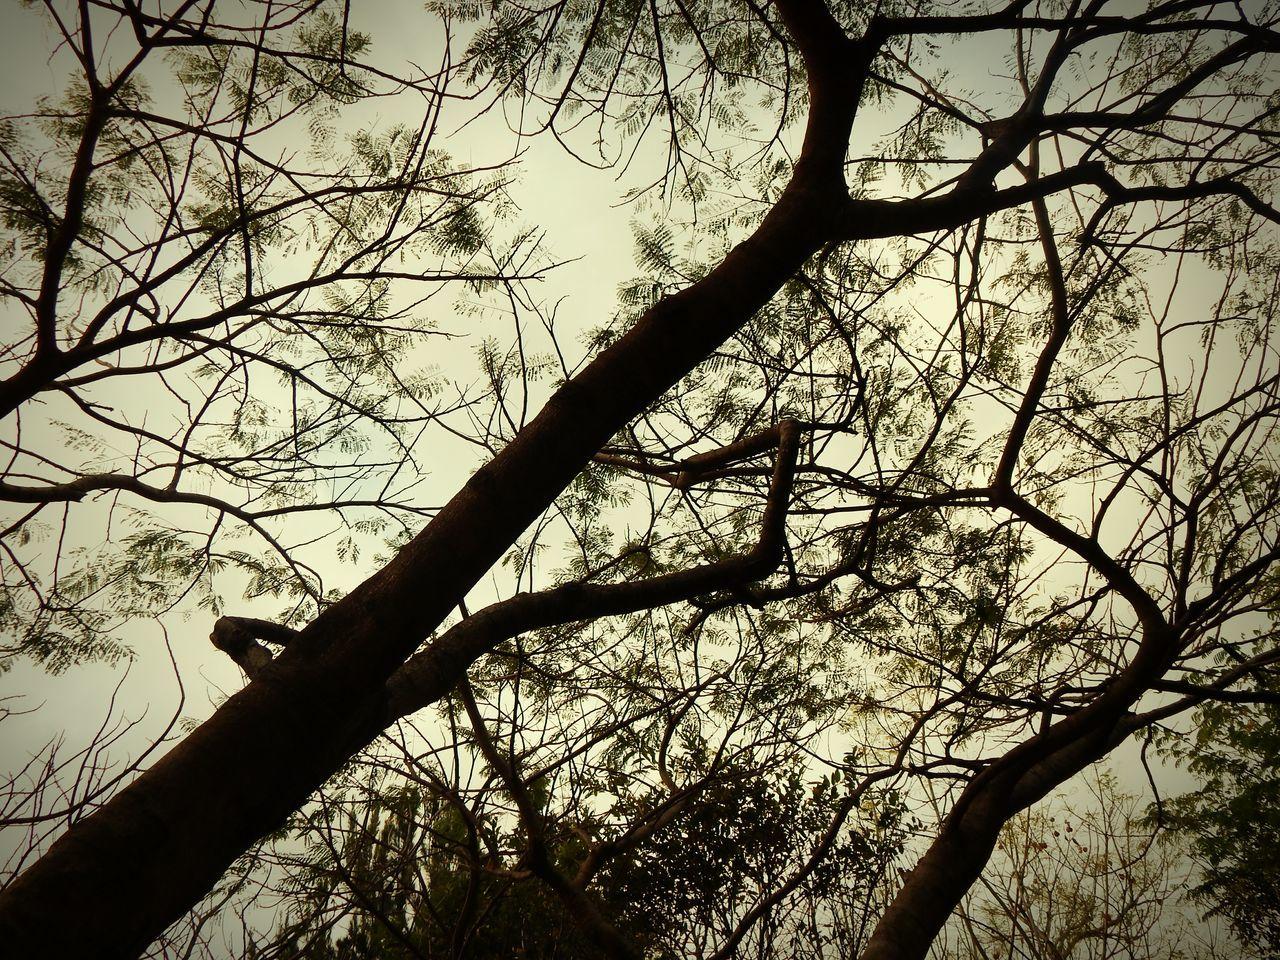 LOVE THE TREES. 💞 Trees And Sky LoveNatureAndMountain Costa Rica Enjoying Life Photography Amazing Taking Photos Nikon Paradise